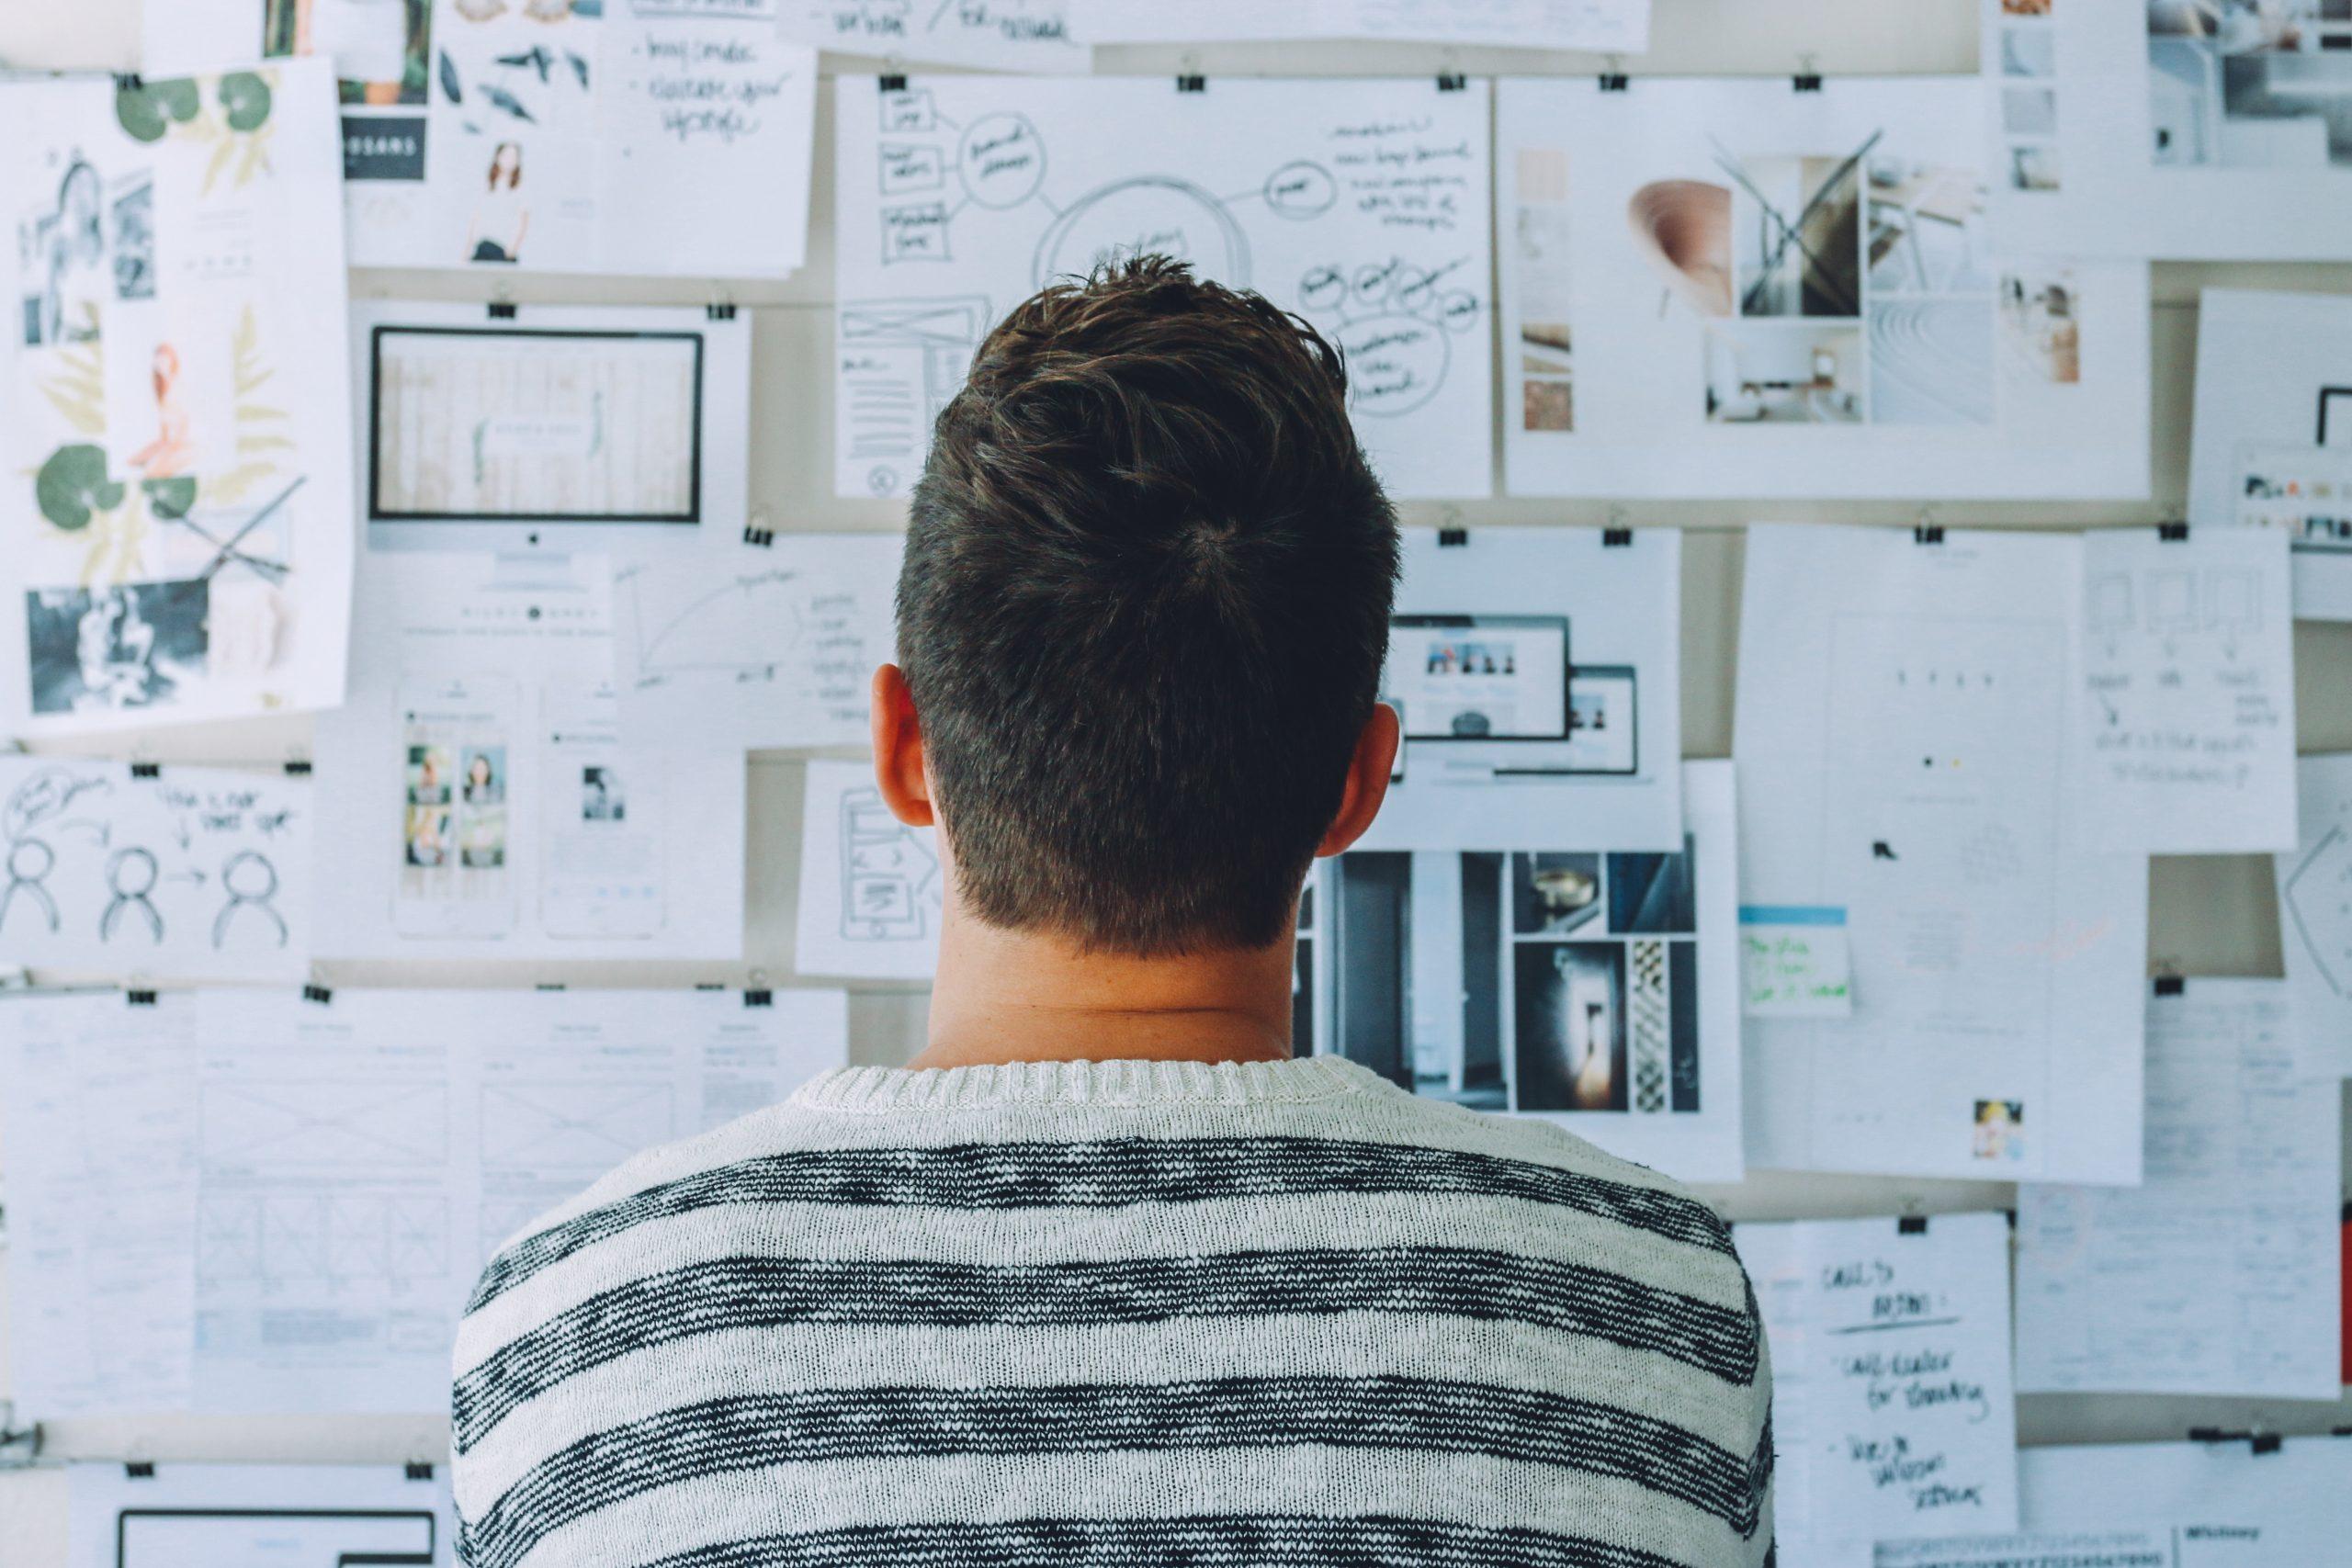 Process transformation and digitalization